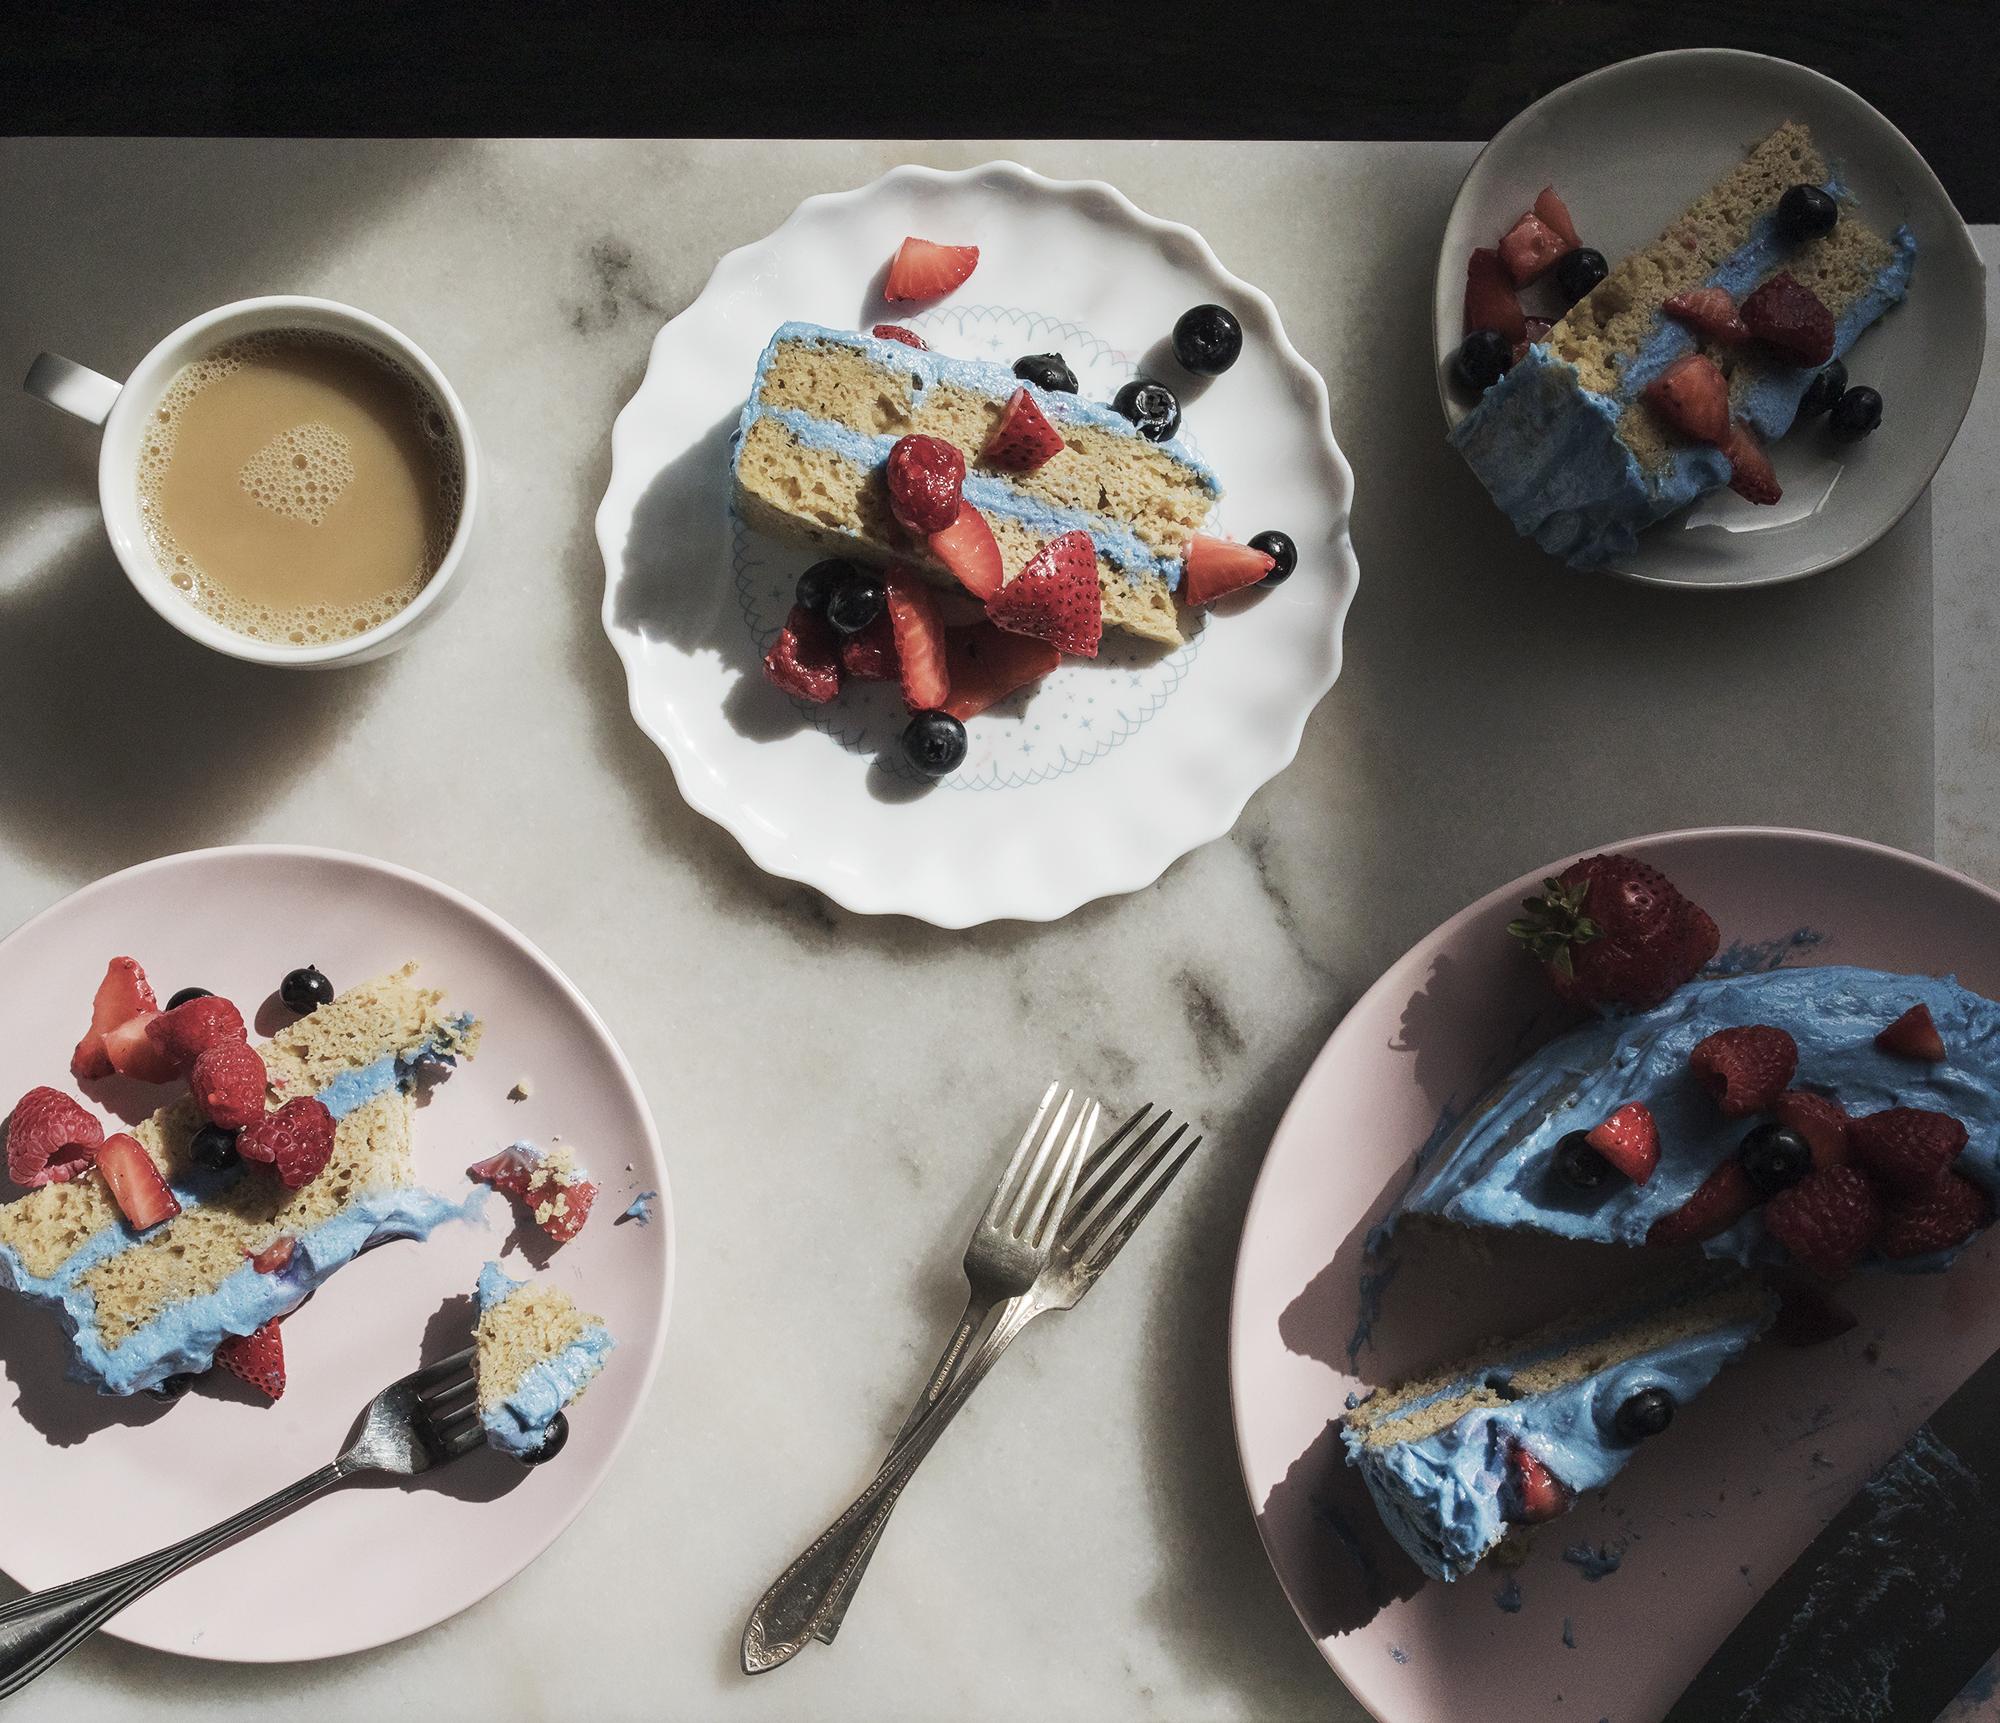 ASHERS BIRTHDAY CAKE 1 better.jpg